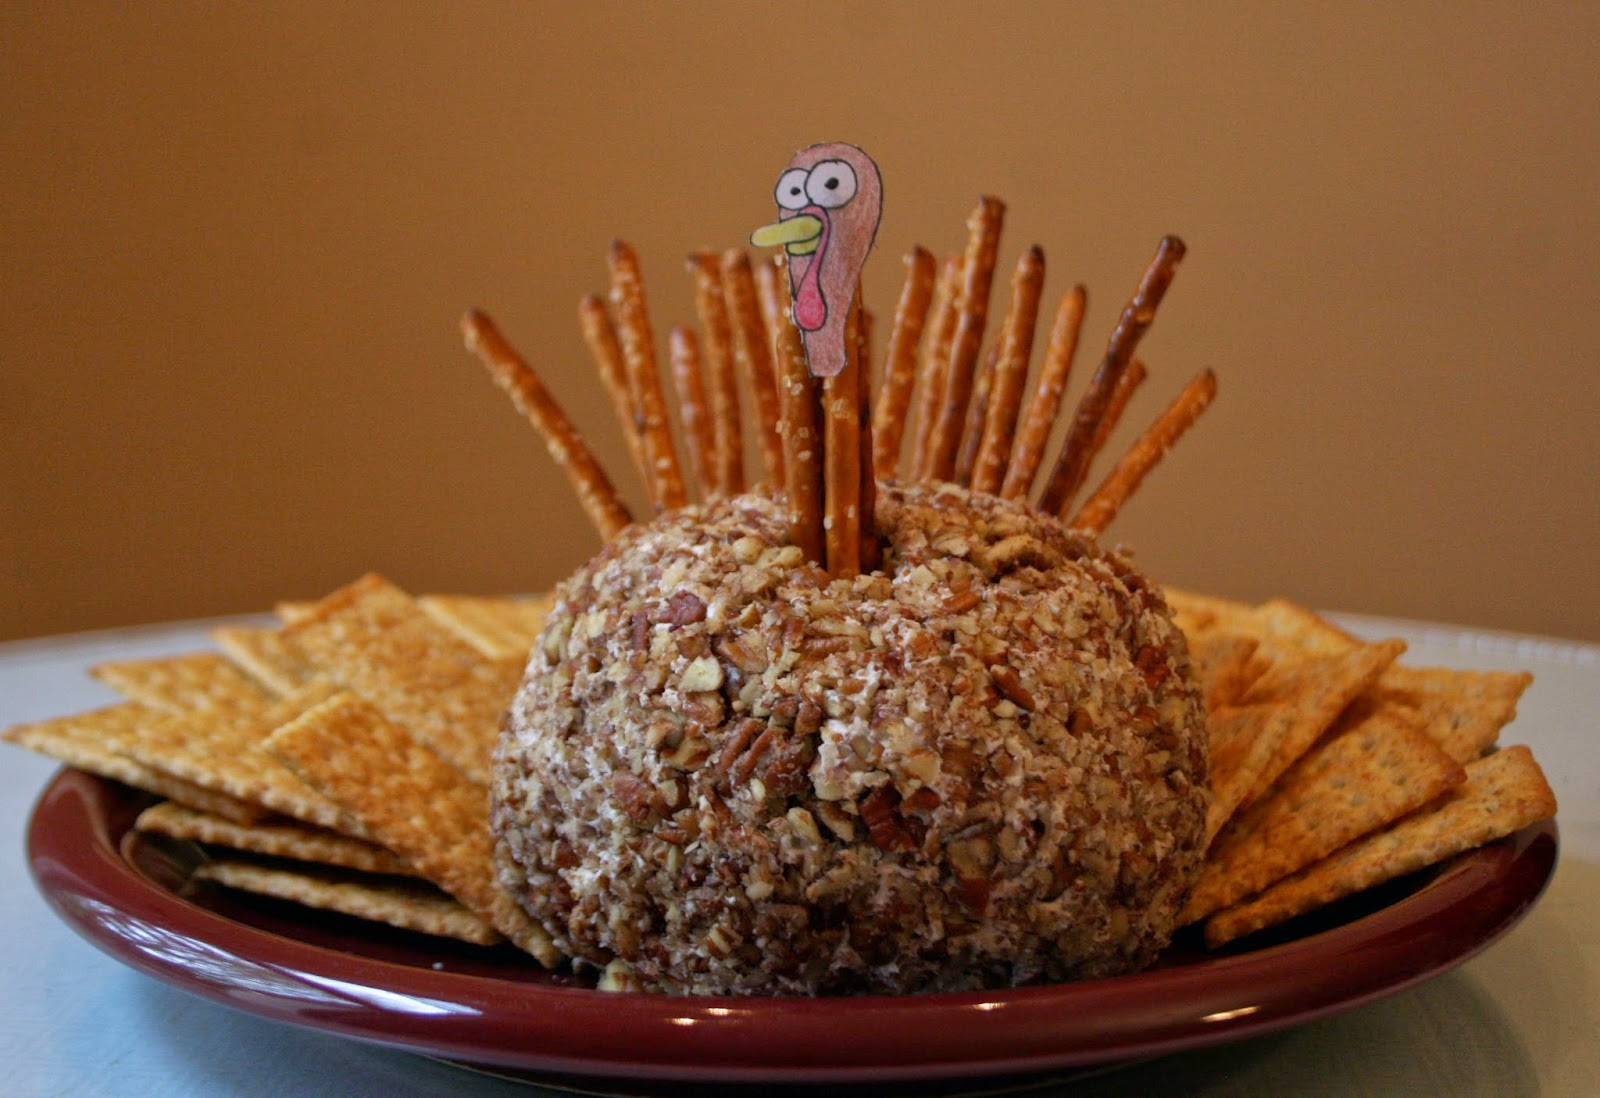 Turkey Cheeseball & Turkey Cheeseball - The Surznick Common Room